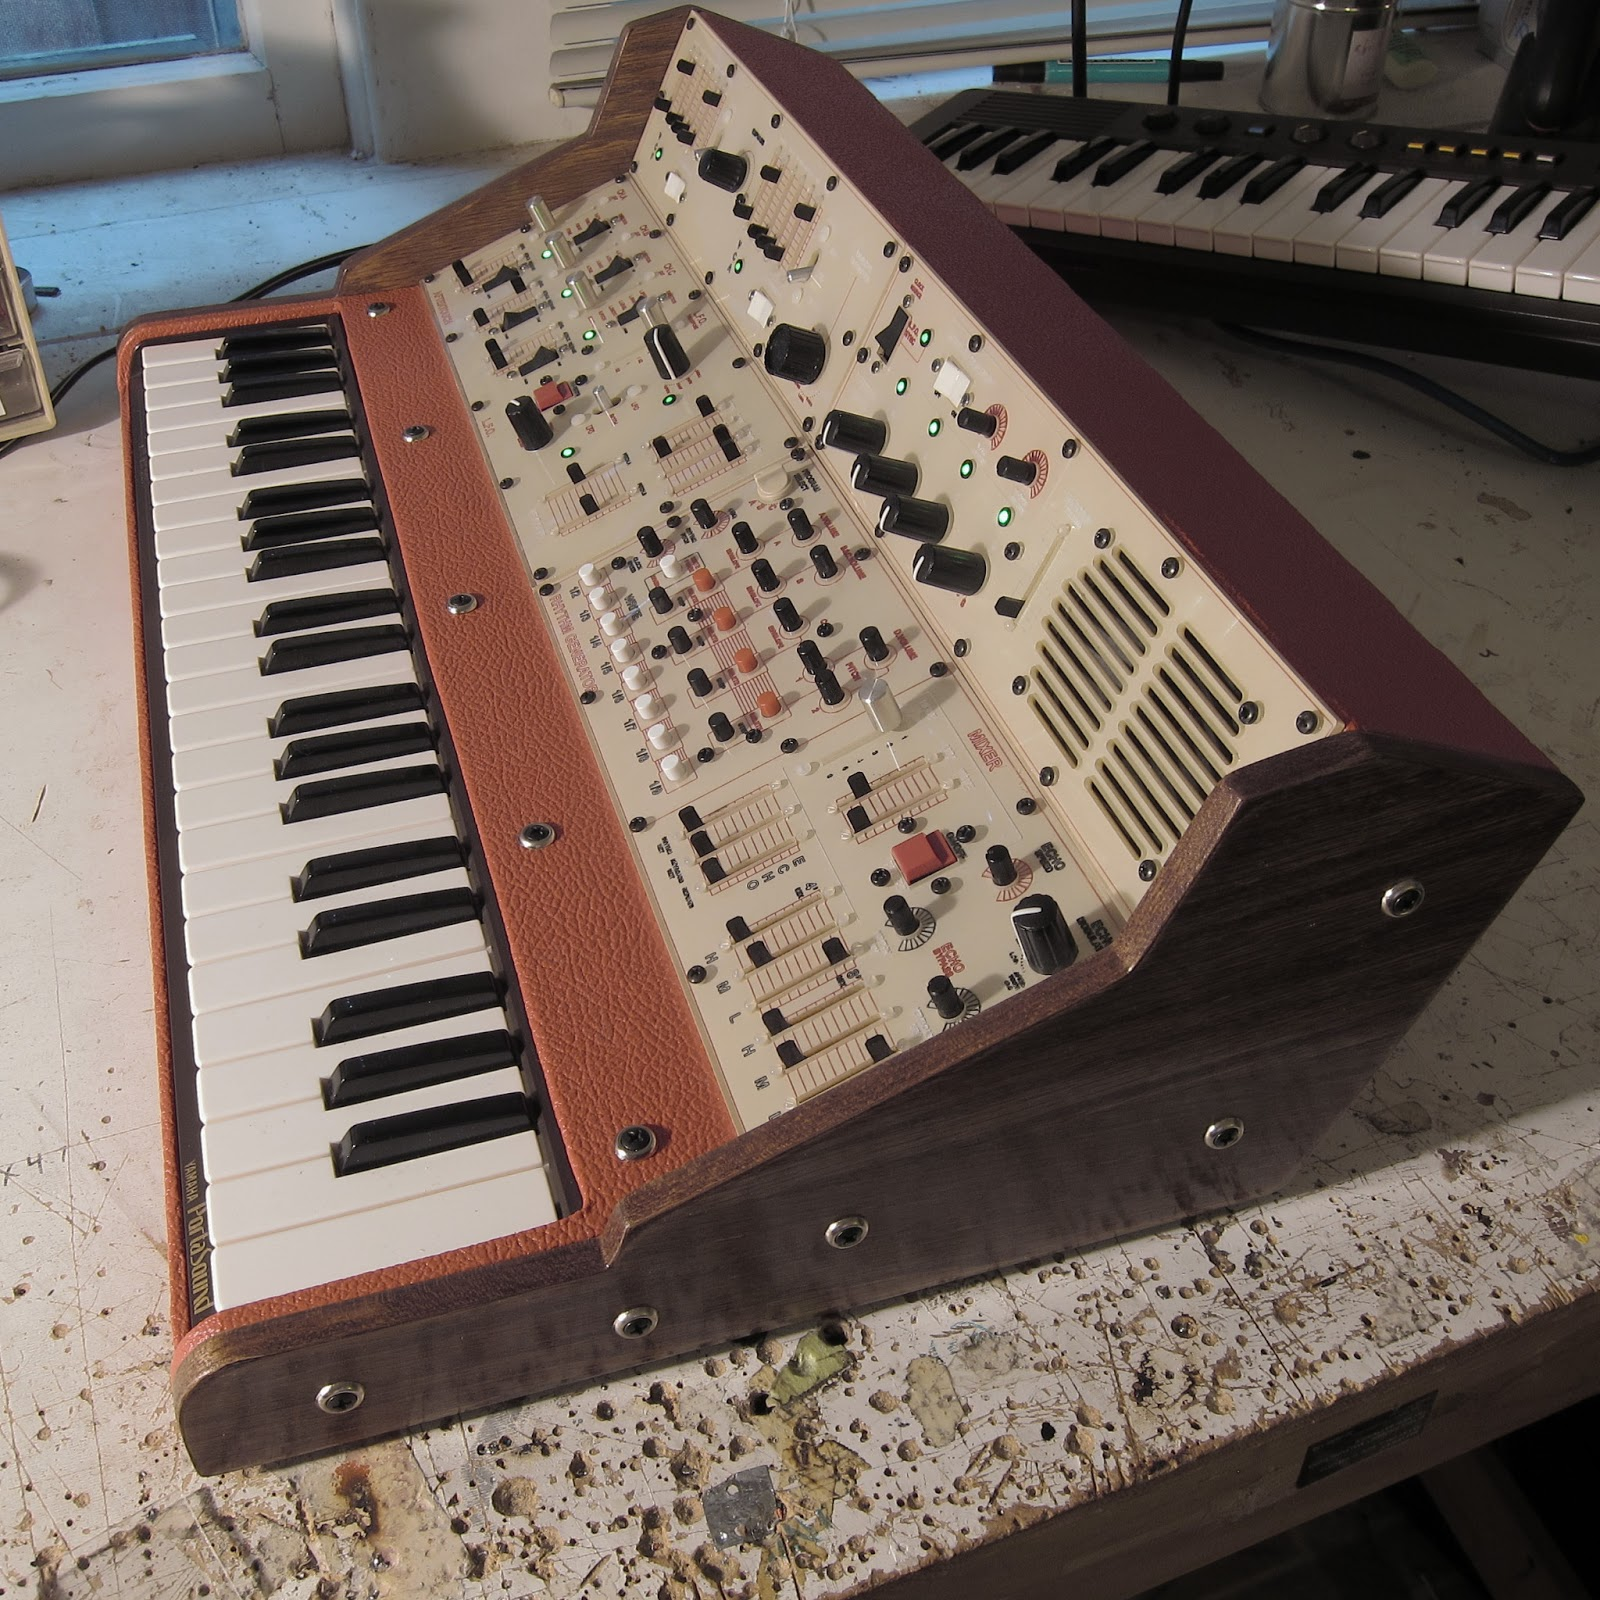 Circuit Diagram Of Music Keyboard Detailed Wiring Diagrams Midi Rs 422